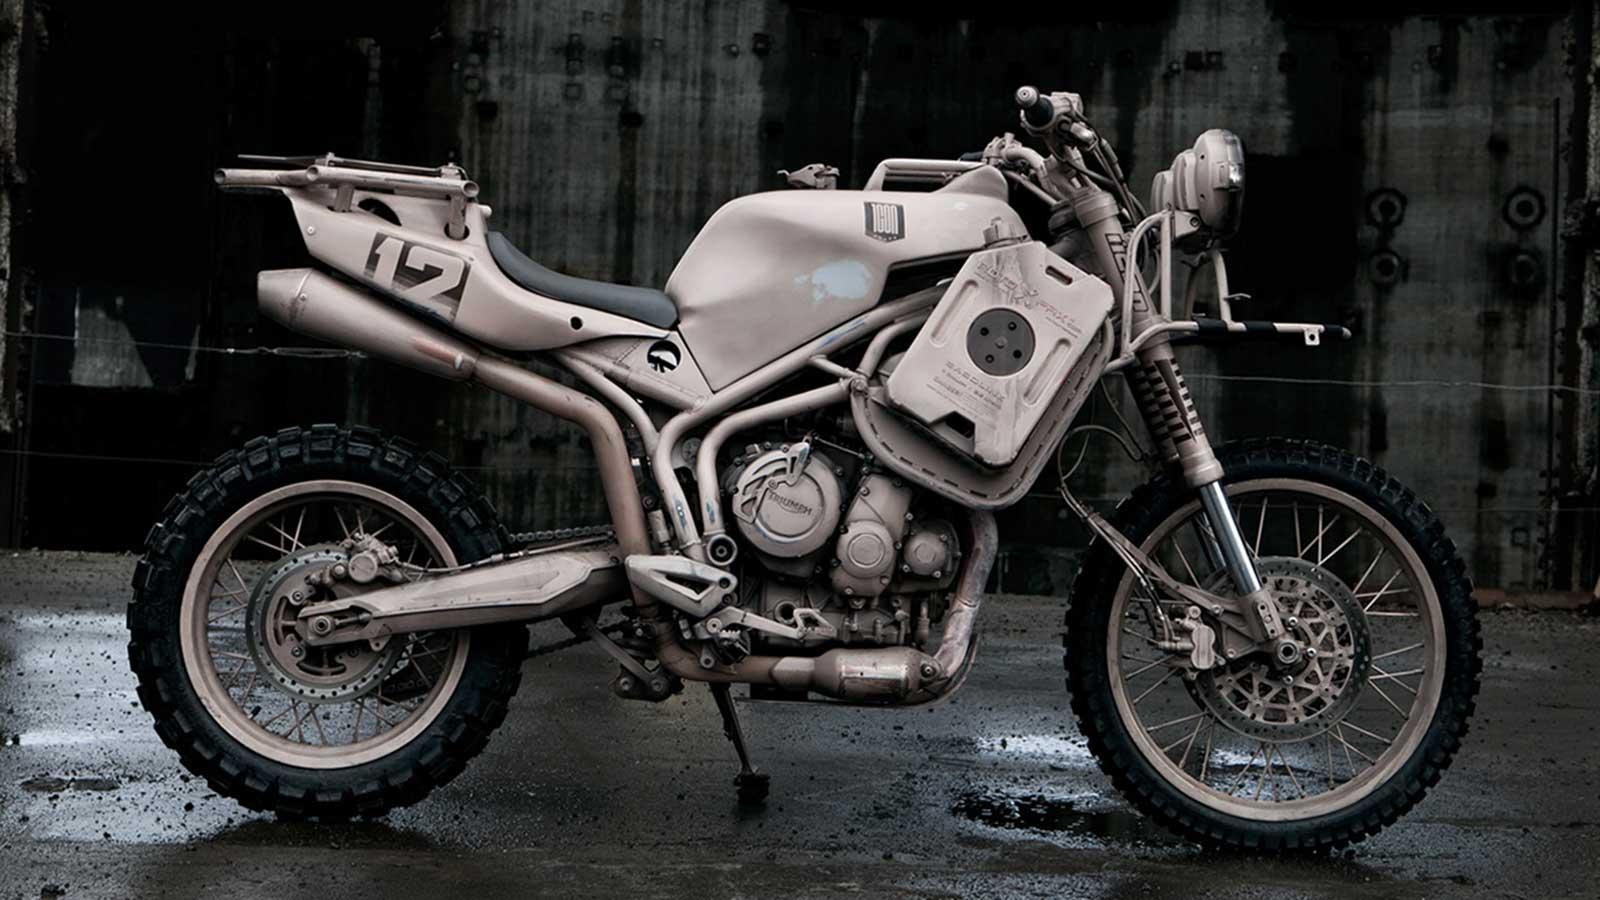 Triumph-Tiger-800xc-Dromedarii-by-Icon-1000-1